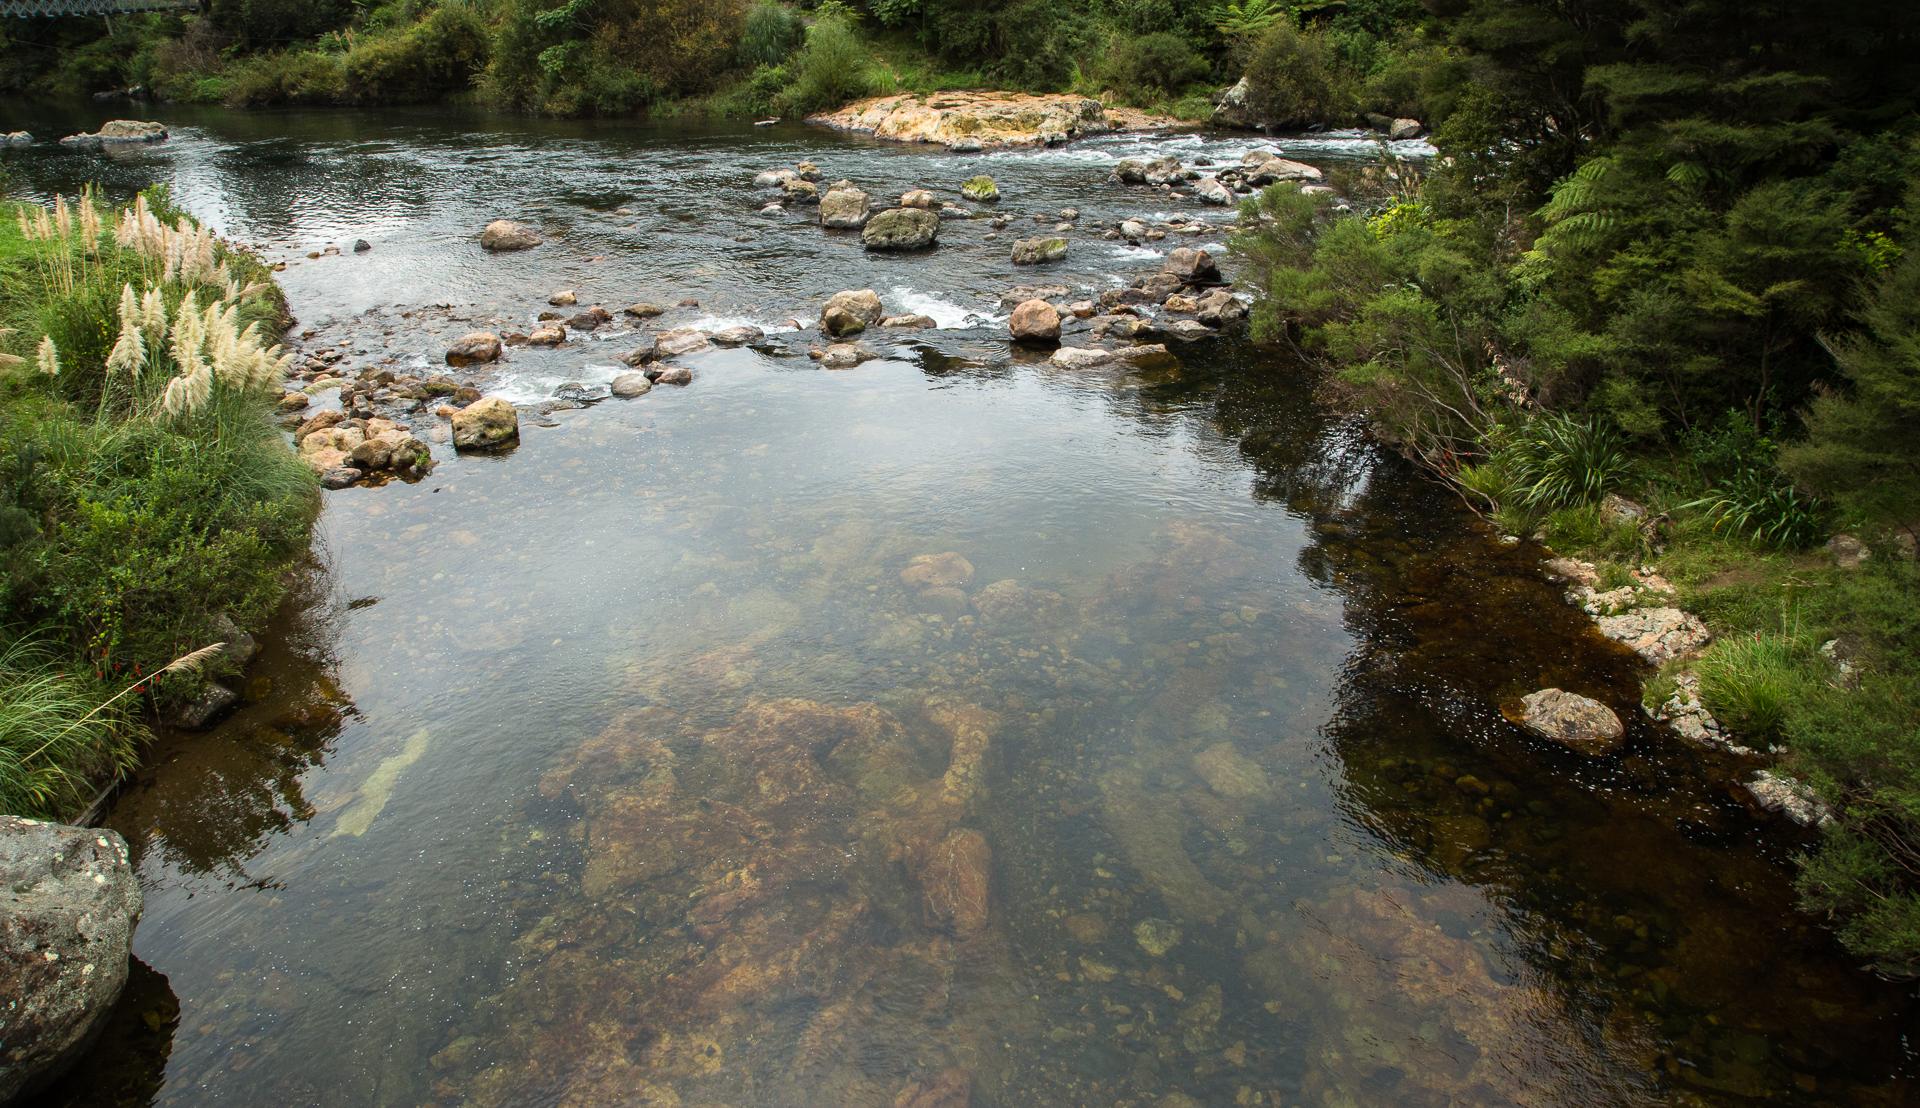 Rock pool in mountain stream